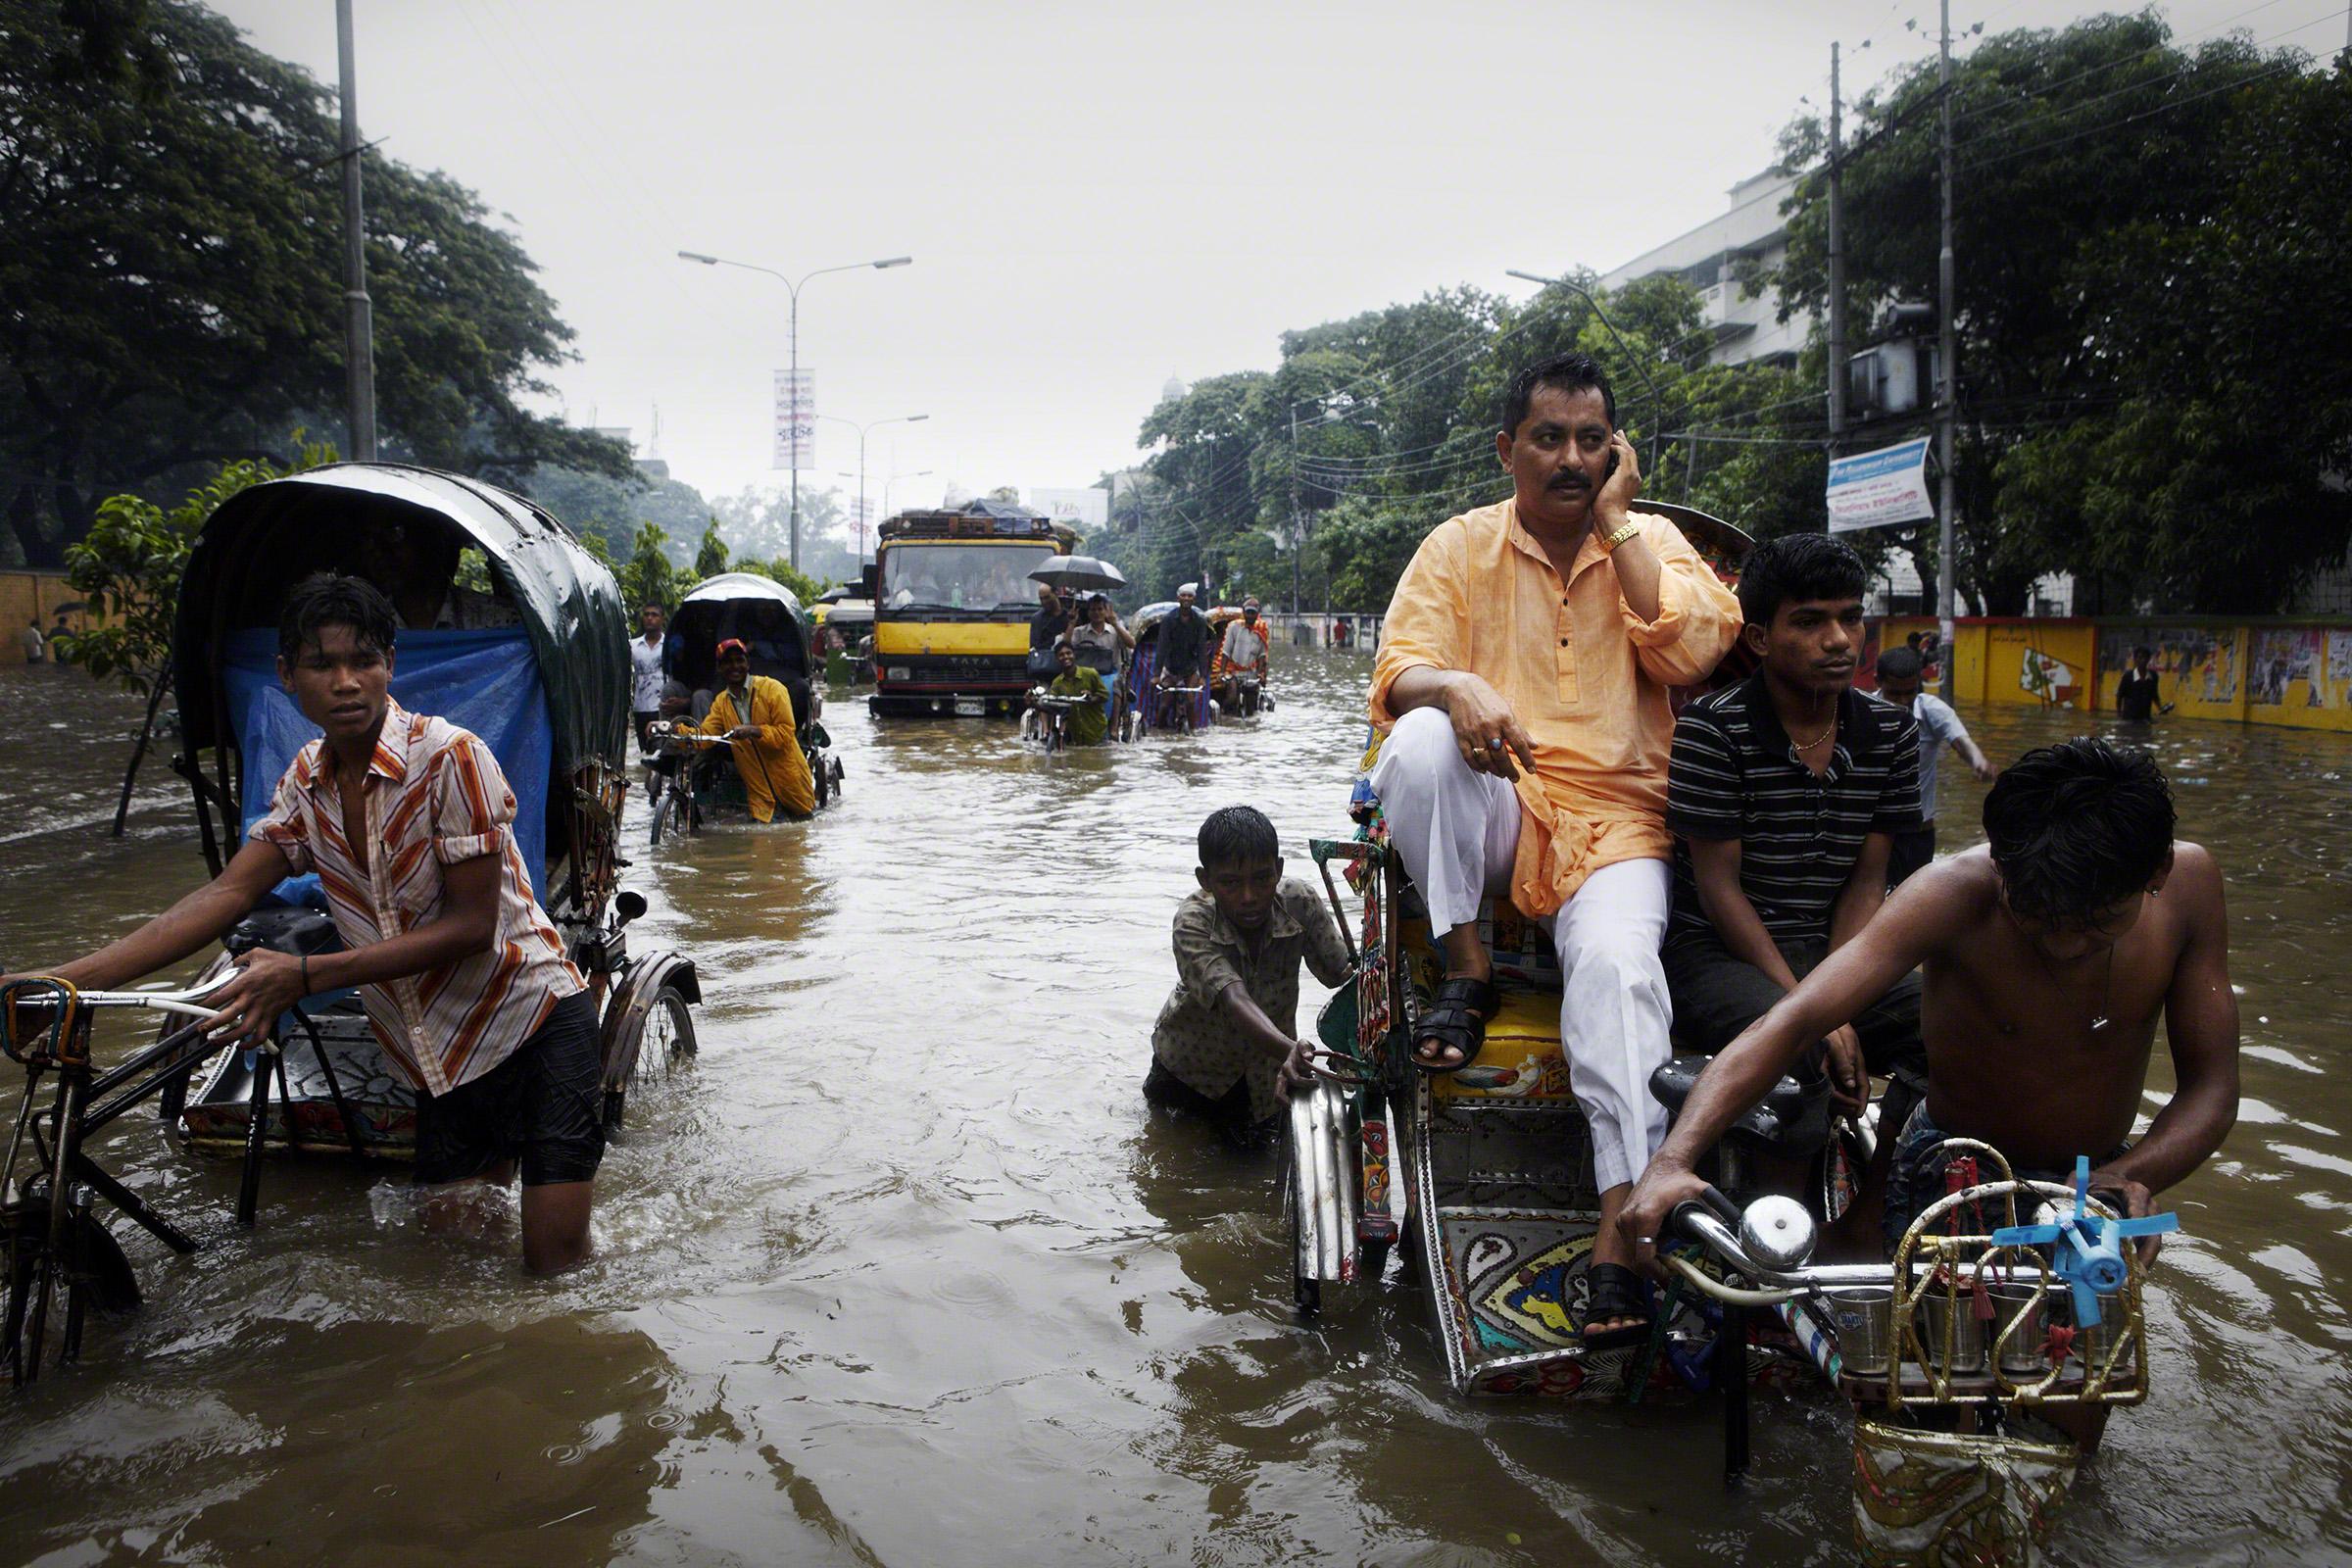 Arambagh, Dhaka, Bangladesh, 2009. After a night of heavy rain, Dhaka experienced widespread flooding around the city. Photo: Jonas Bendiksen